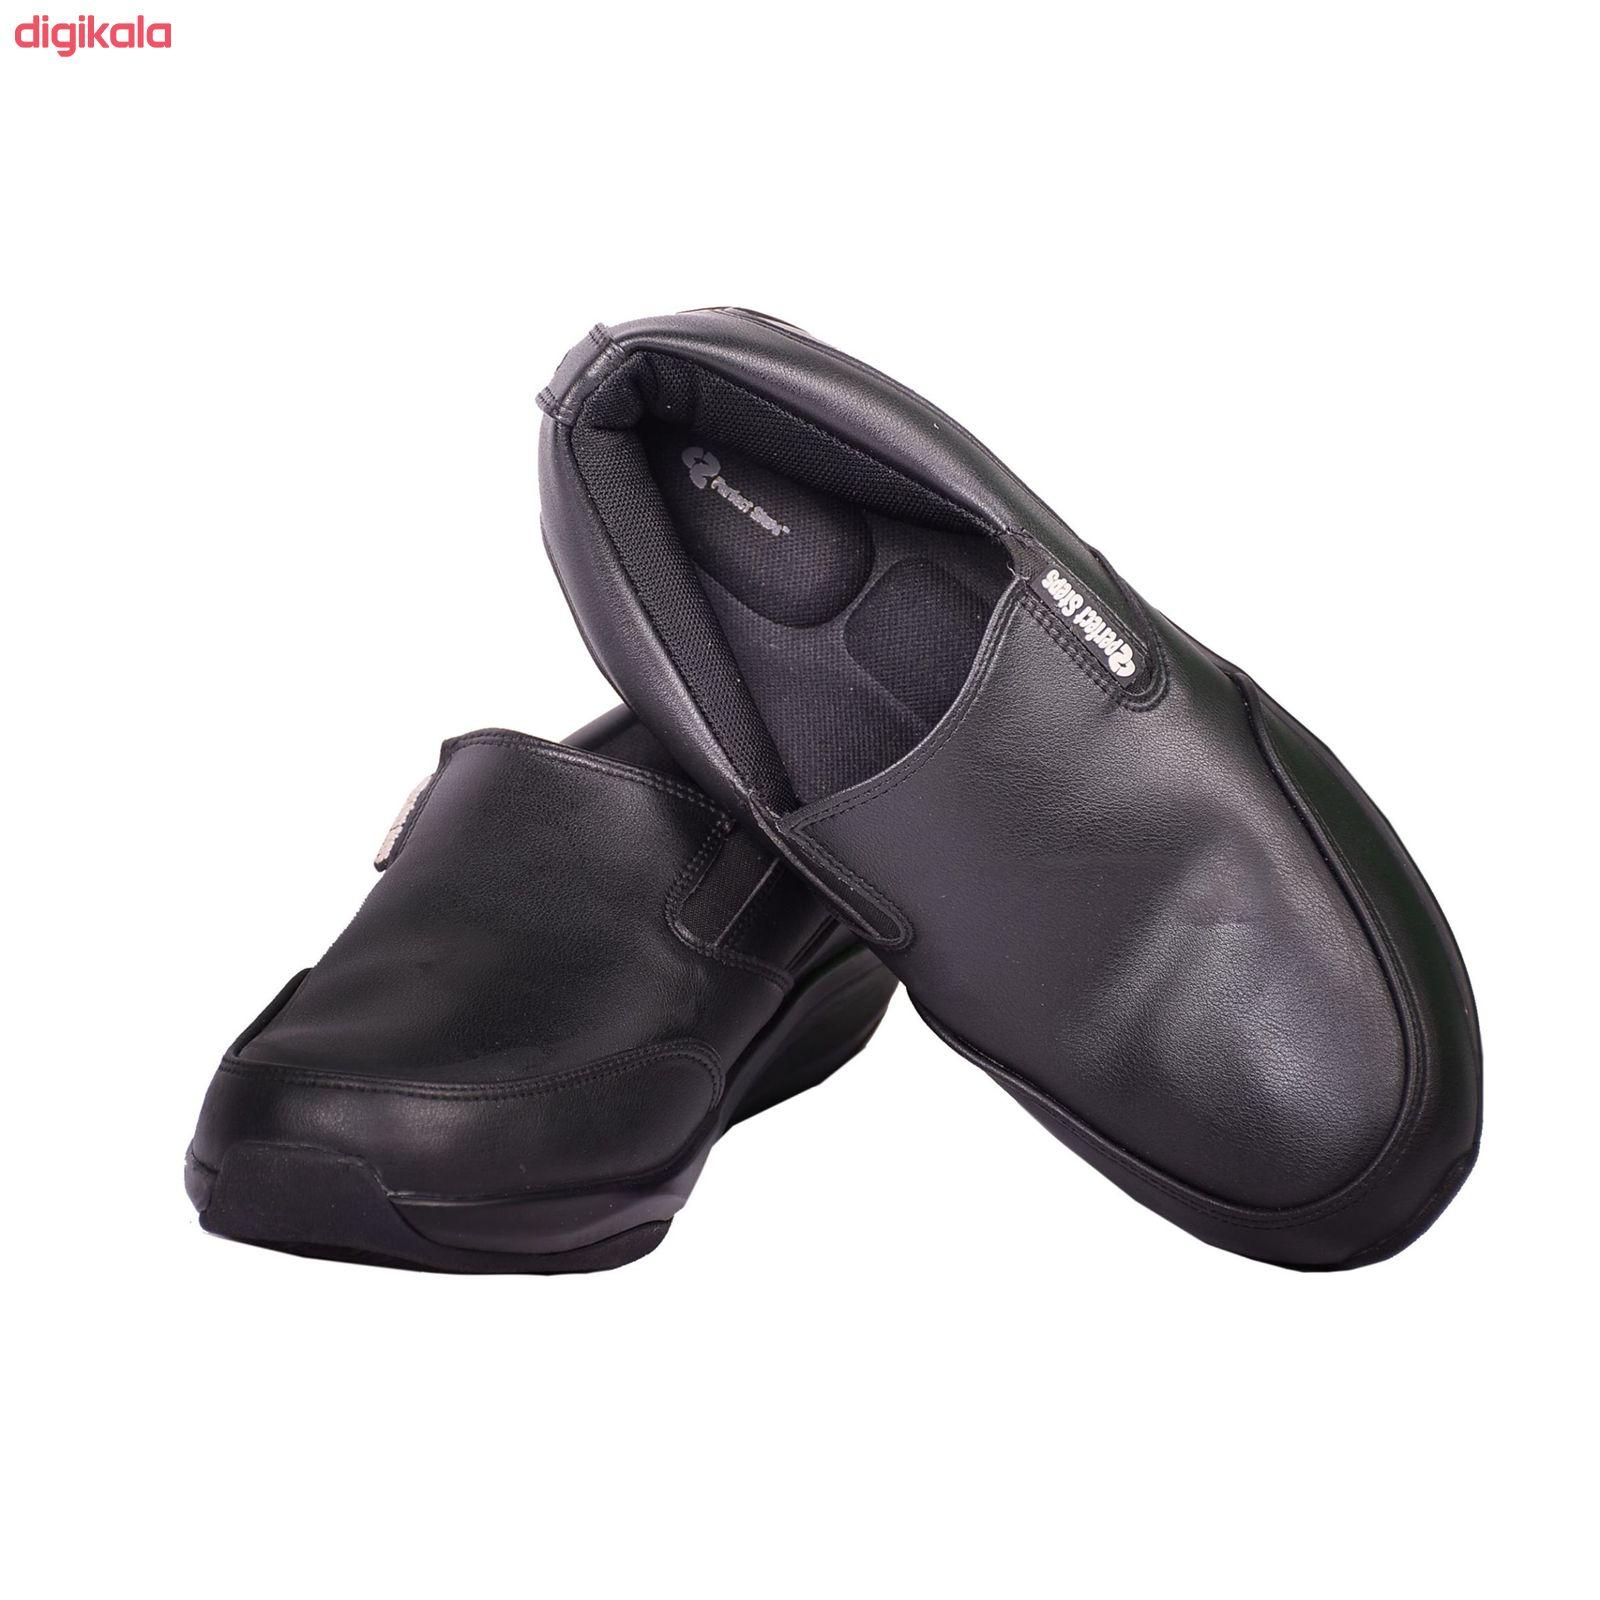 کفش مخصوص پیاده روی زنانه پرفکت استپس مدل پریمو کژوال رنگ مشکی main 1 6